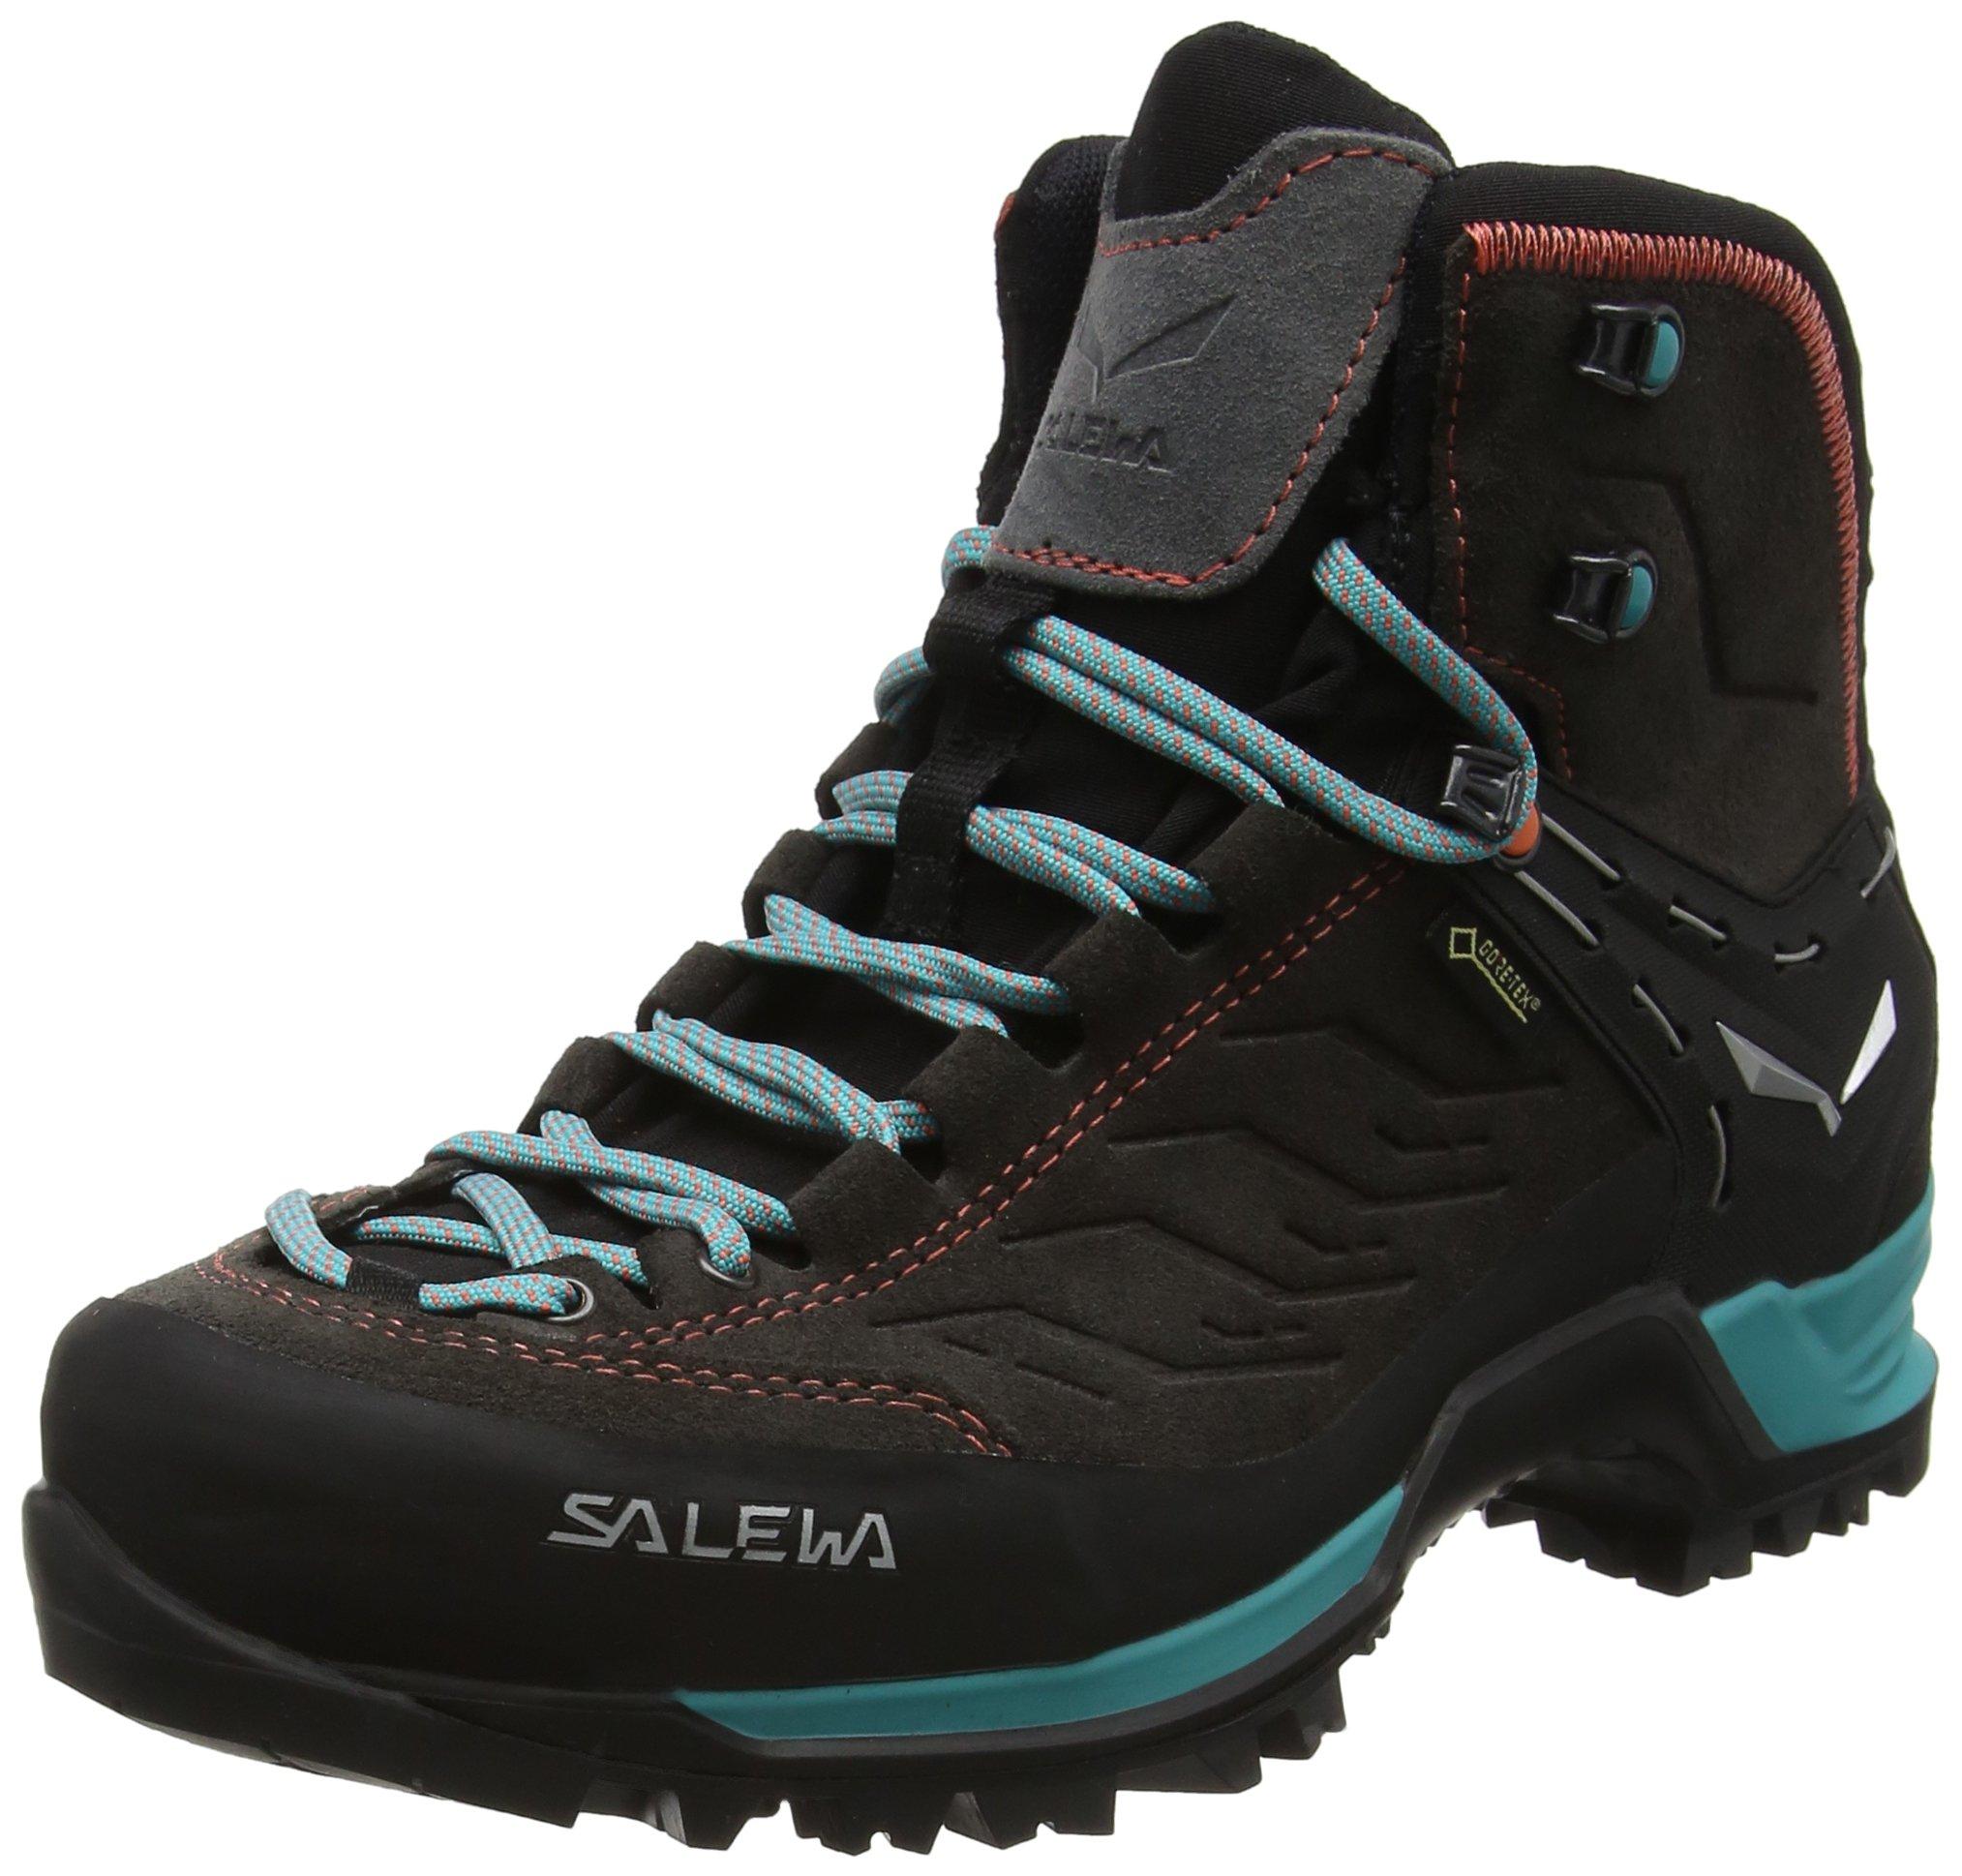 Salewa Women's Mtn Trainer Mid Gtx-W Mountaineering Boot, Magnet/Viridian Green, 8.5 D US